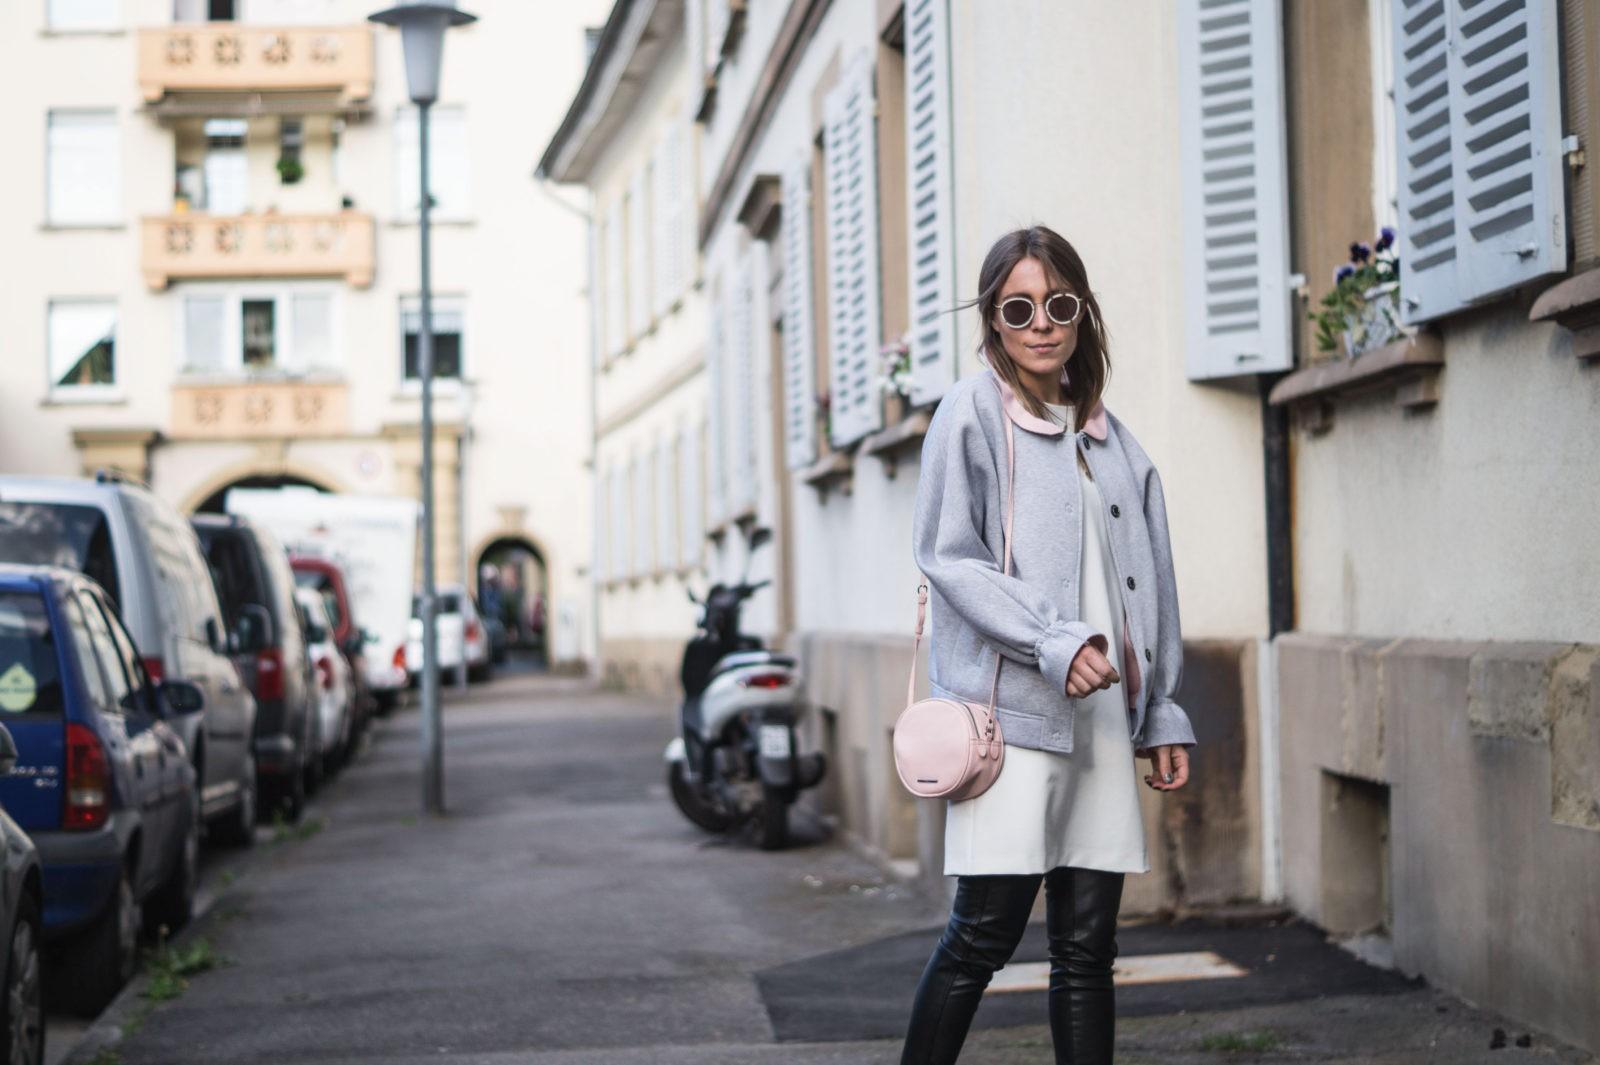 Gray-Bomber-Jacket-Bomberjacke-Grau-Rueschen-Rosa-Modeblog-Heidelberg-Fashionblogger-3